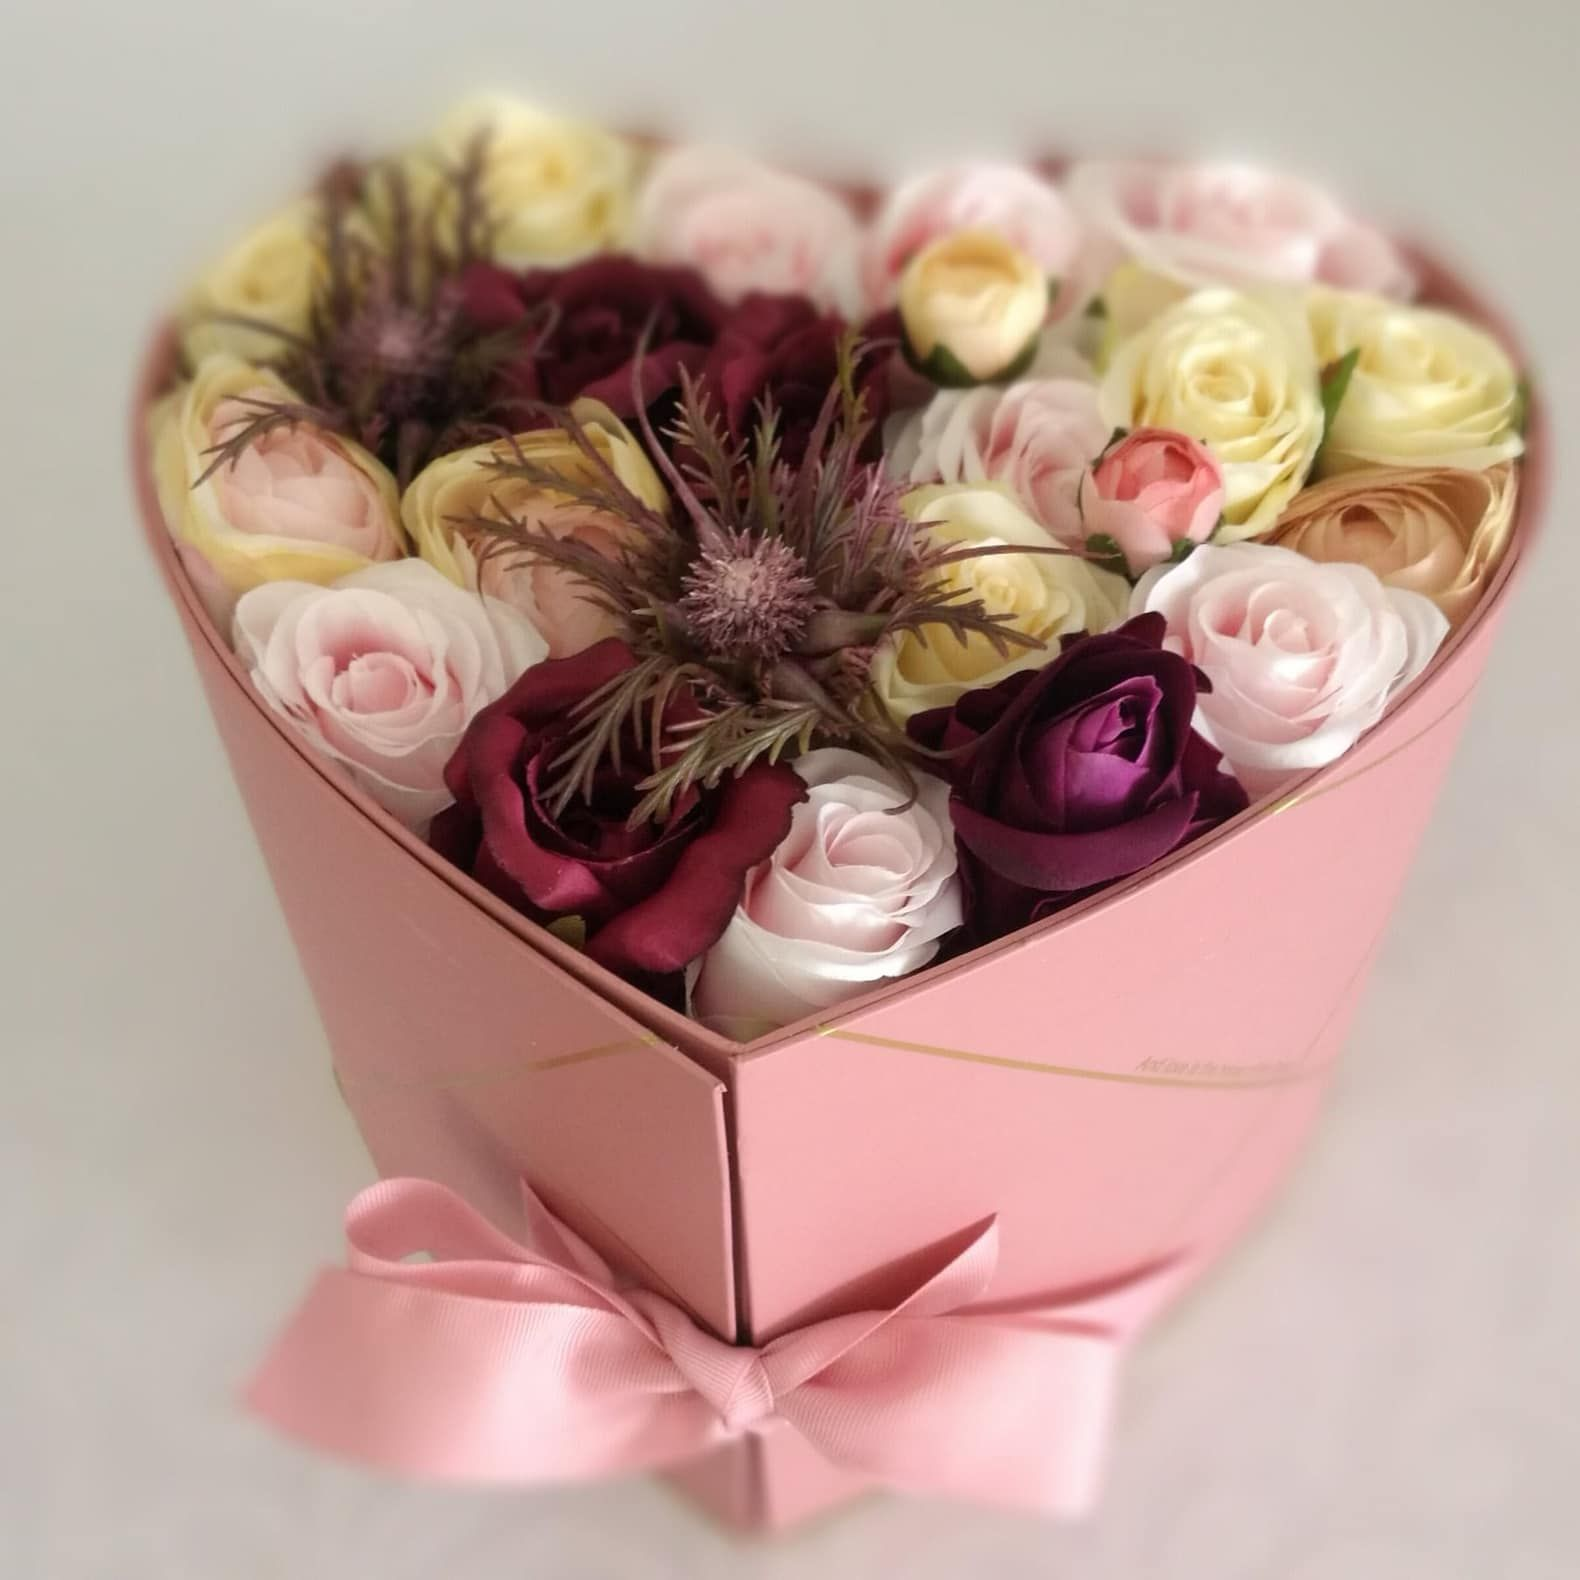 Flower Box Serce Z Kwiatami Swiateczne Atelier Flower Boxes Flower Gift Diy Gifts